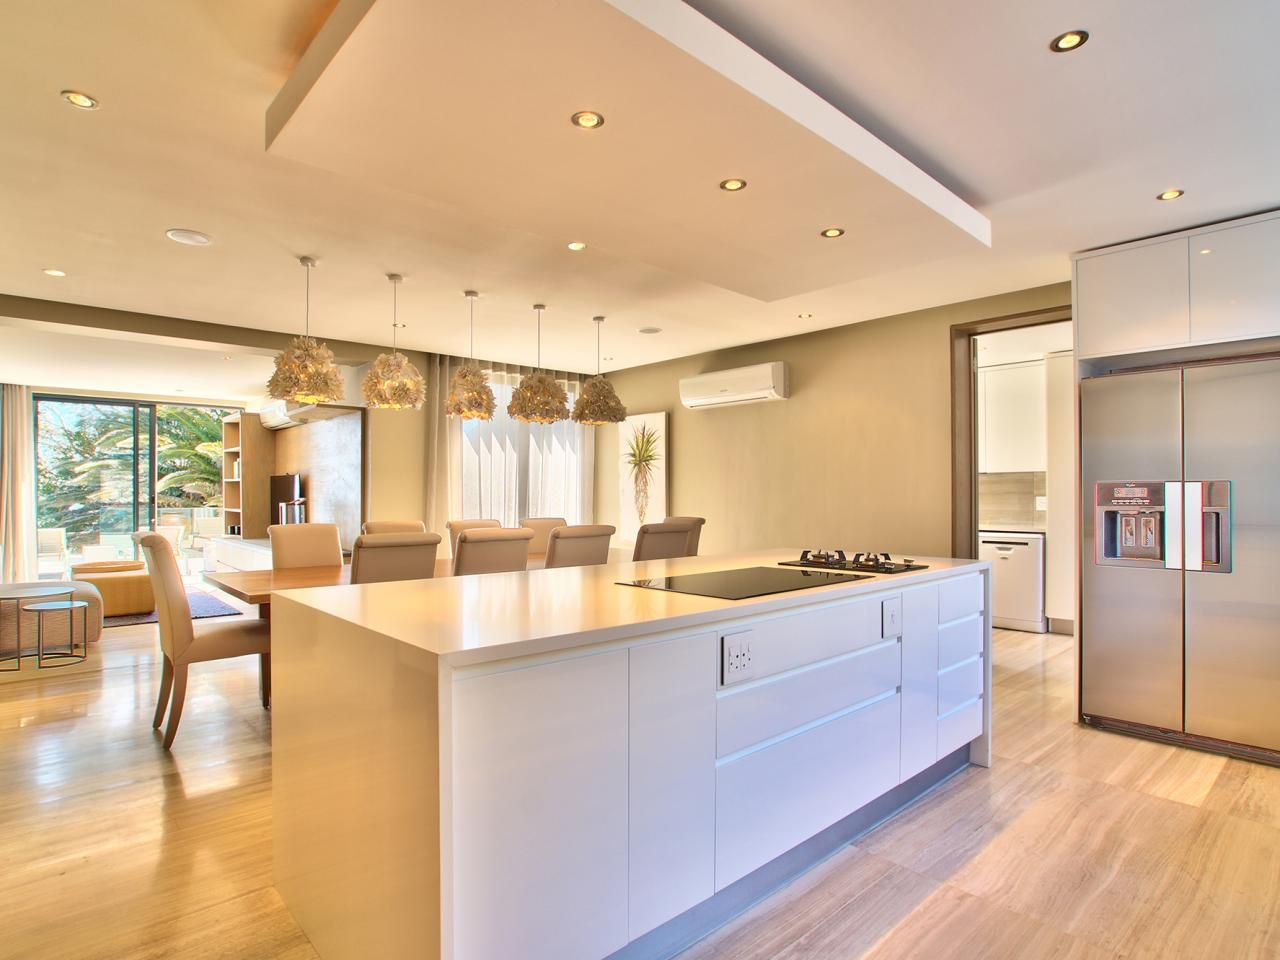 6 Suspended Ceiling Decors Design Ideas For